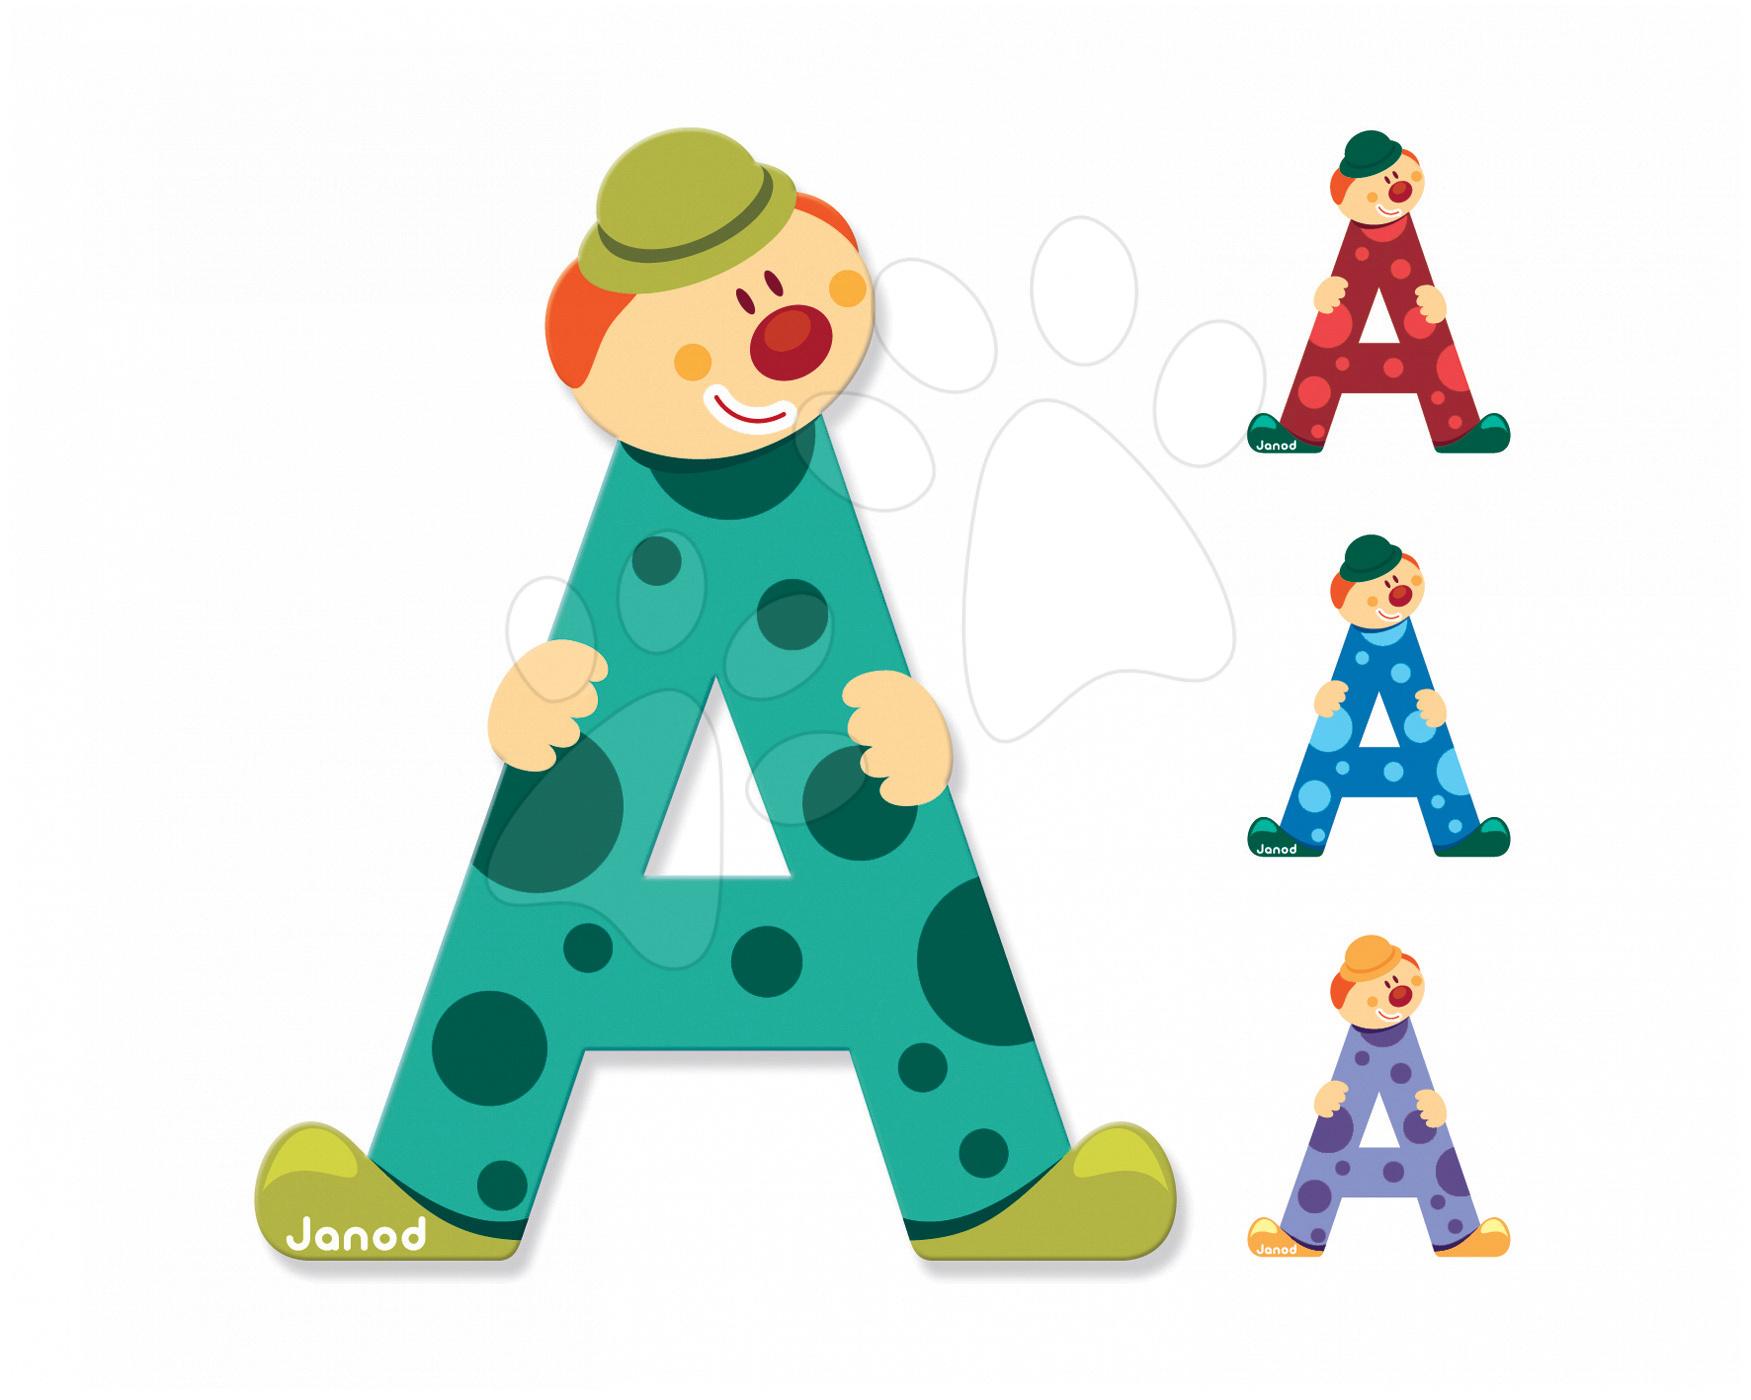 Dekorácie do detských izieb - Drevené písmeno A Clown Letter Janod lepiace 9 cm zelené/fialové/červené/modré